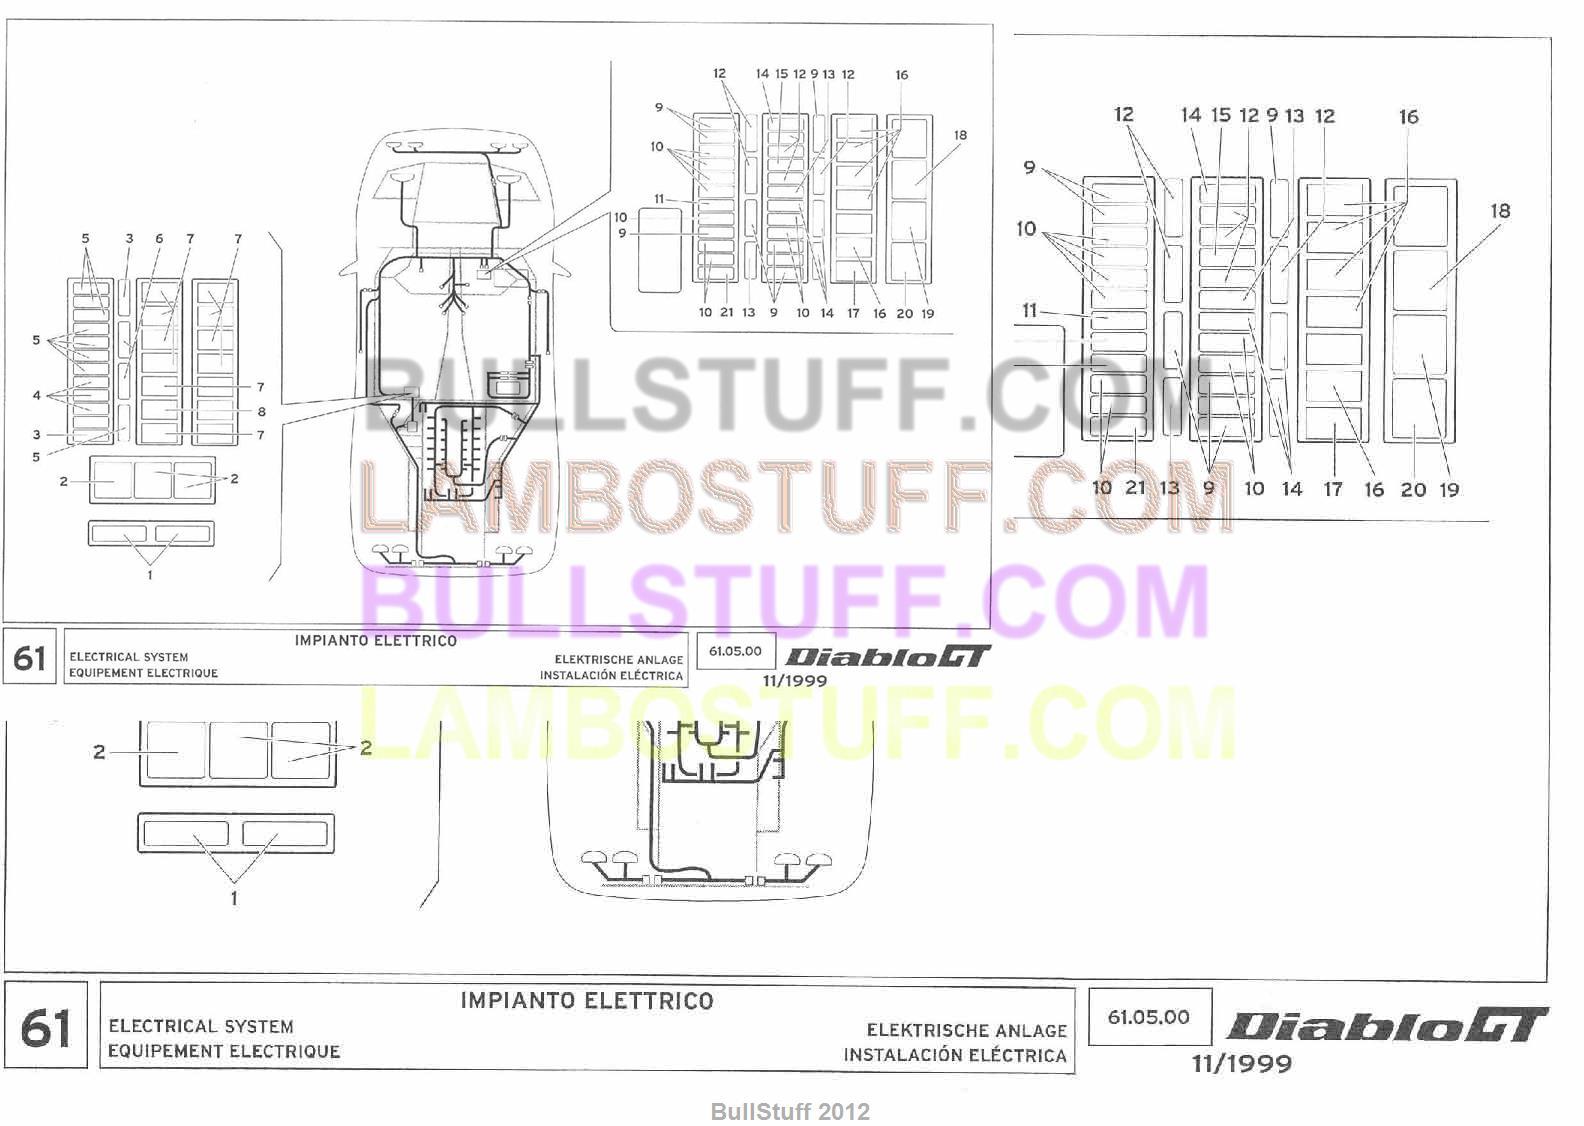 1999 lamborghini diablo gt usa electrical system 61 05 00 rh bullstuff com